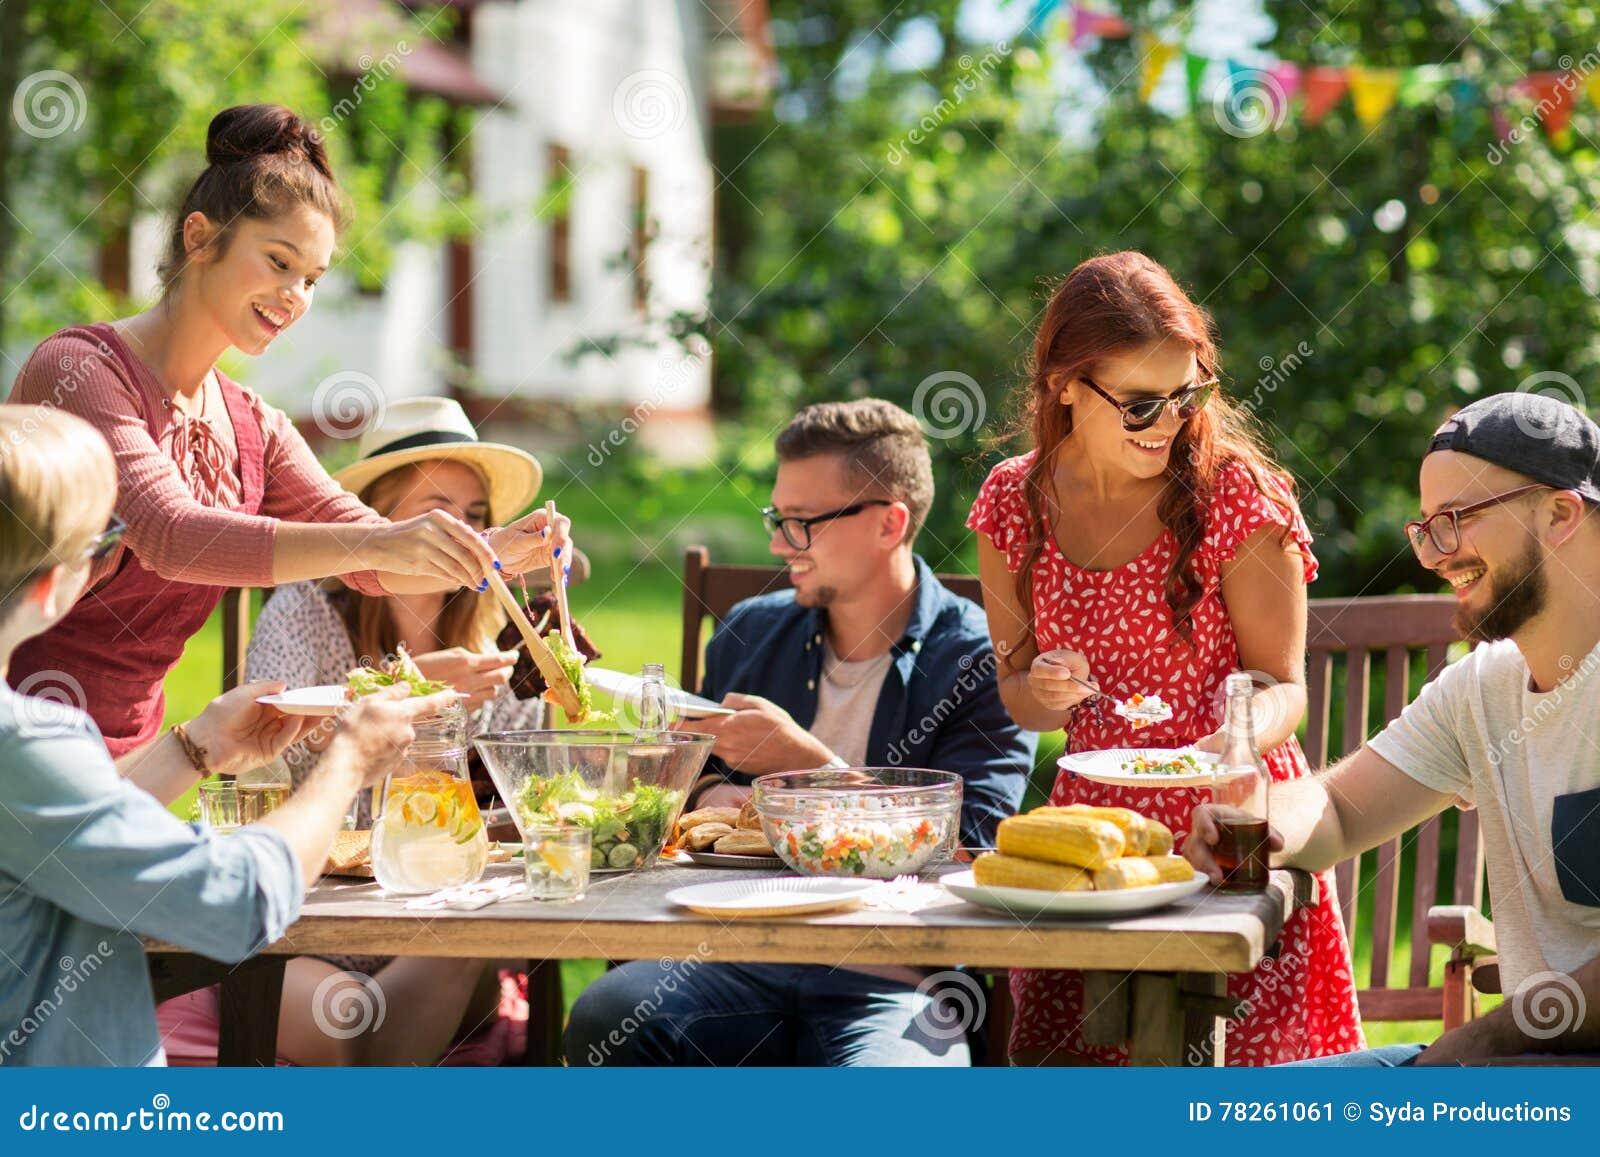 Happy Friends Having Dinner At Summer Garden Party Stock